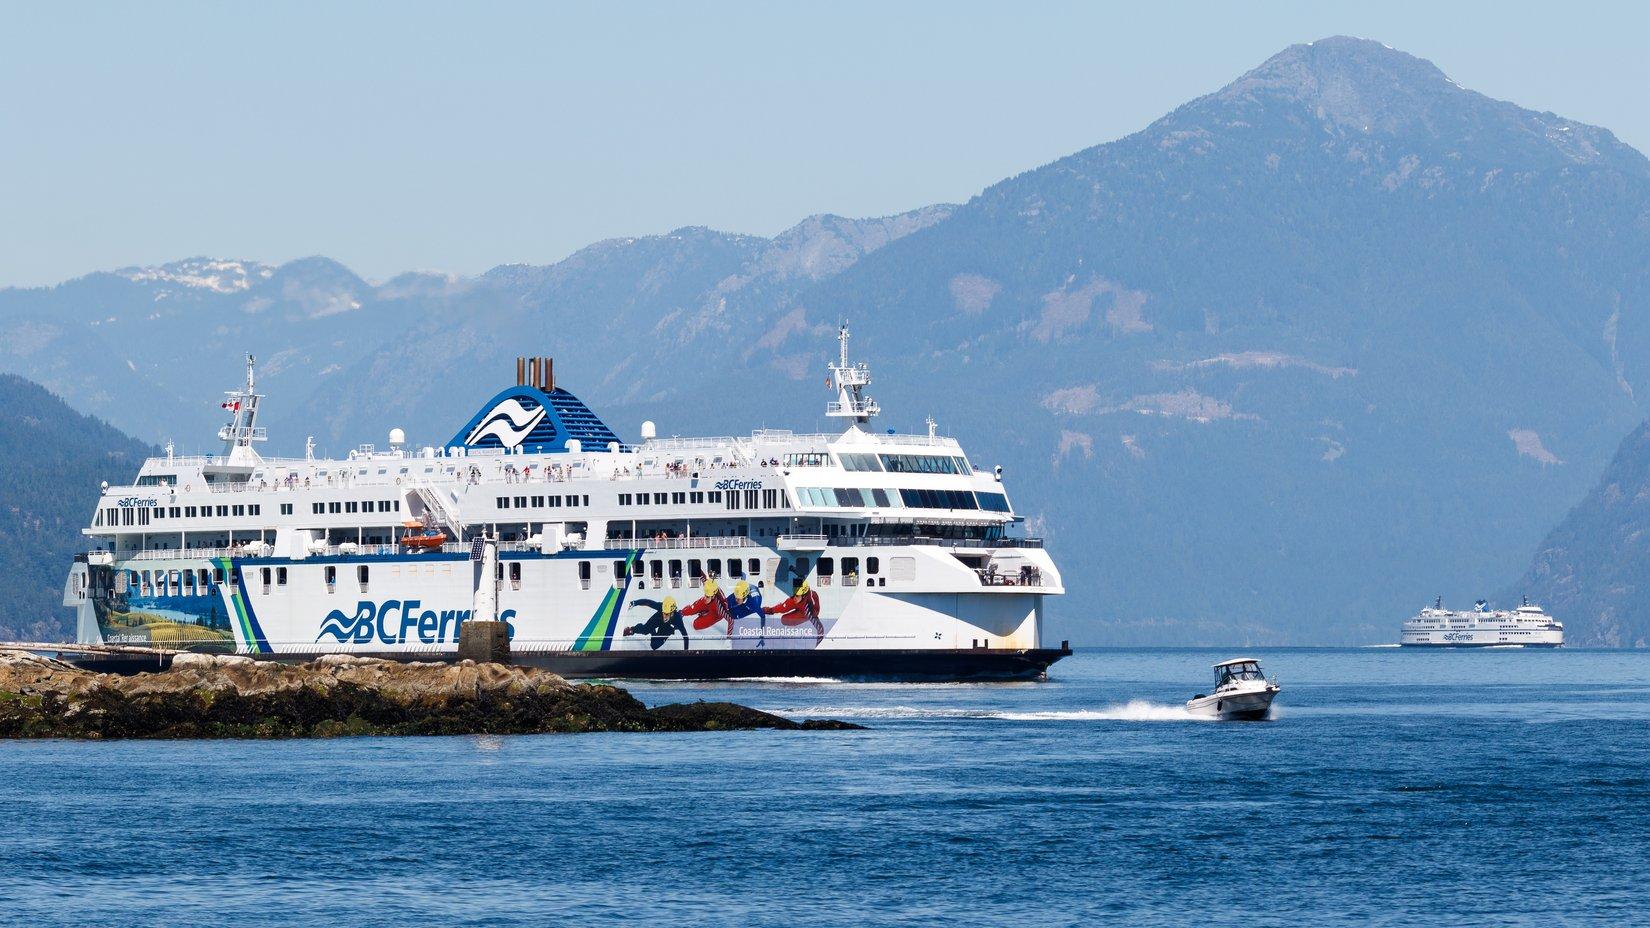 Ferry_Traffic_Vancouver__Horseshoe_Bay_-_aezoss__Flickr.jpg